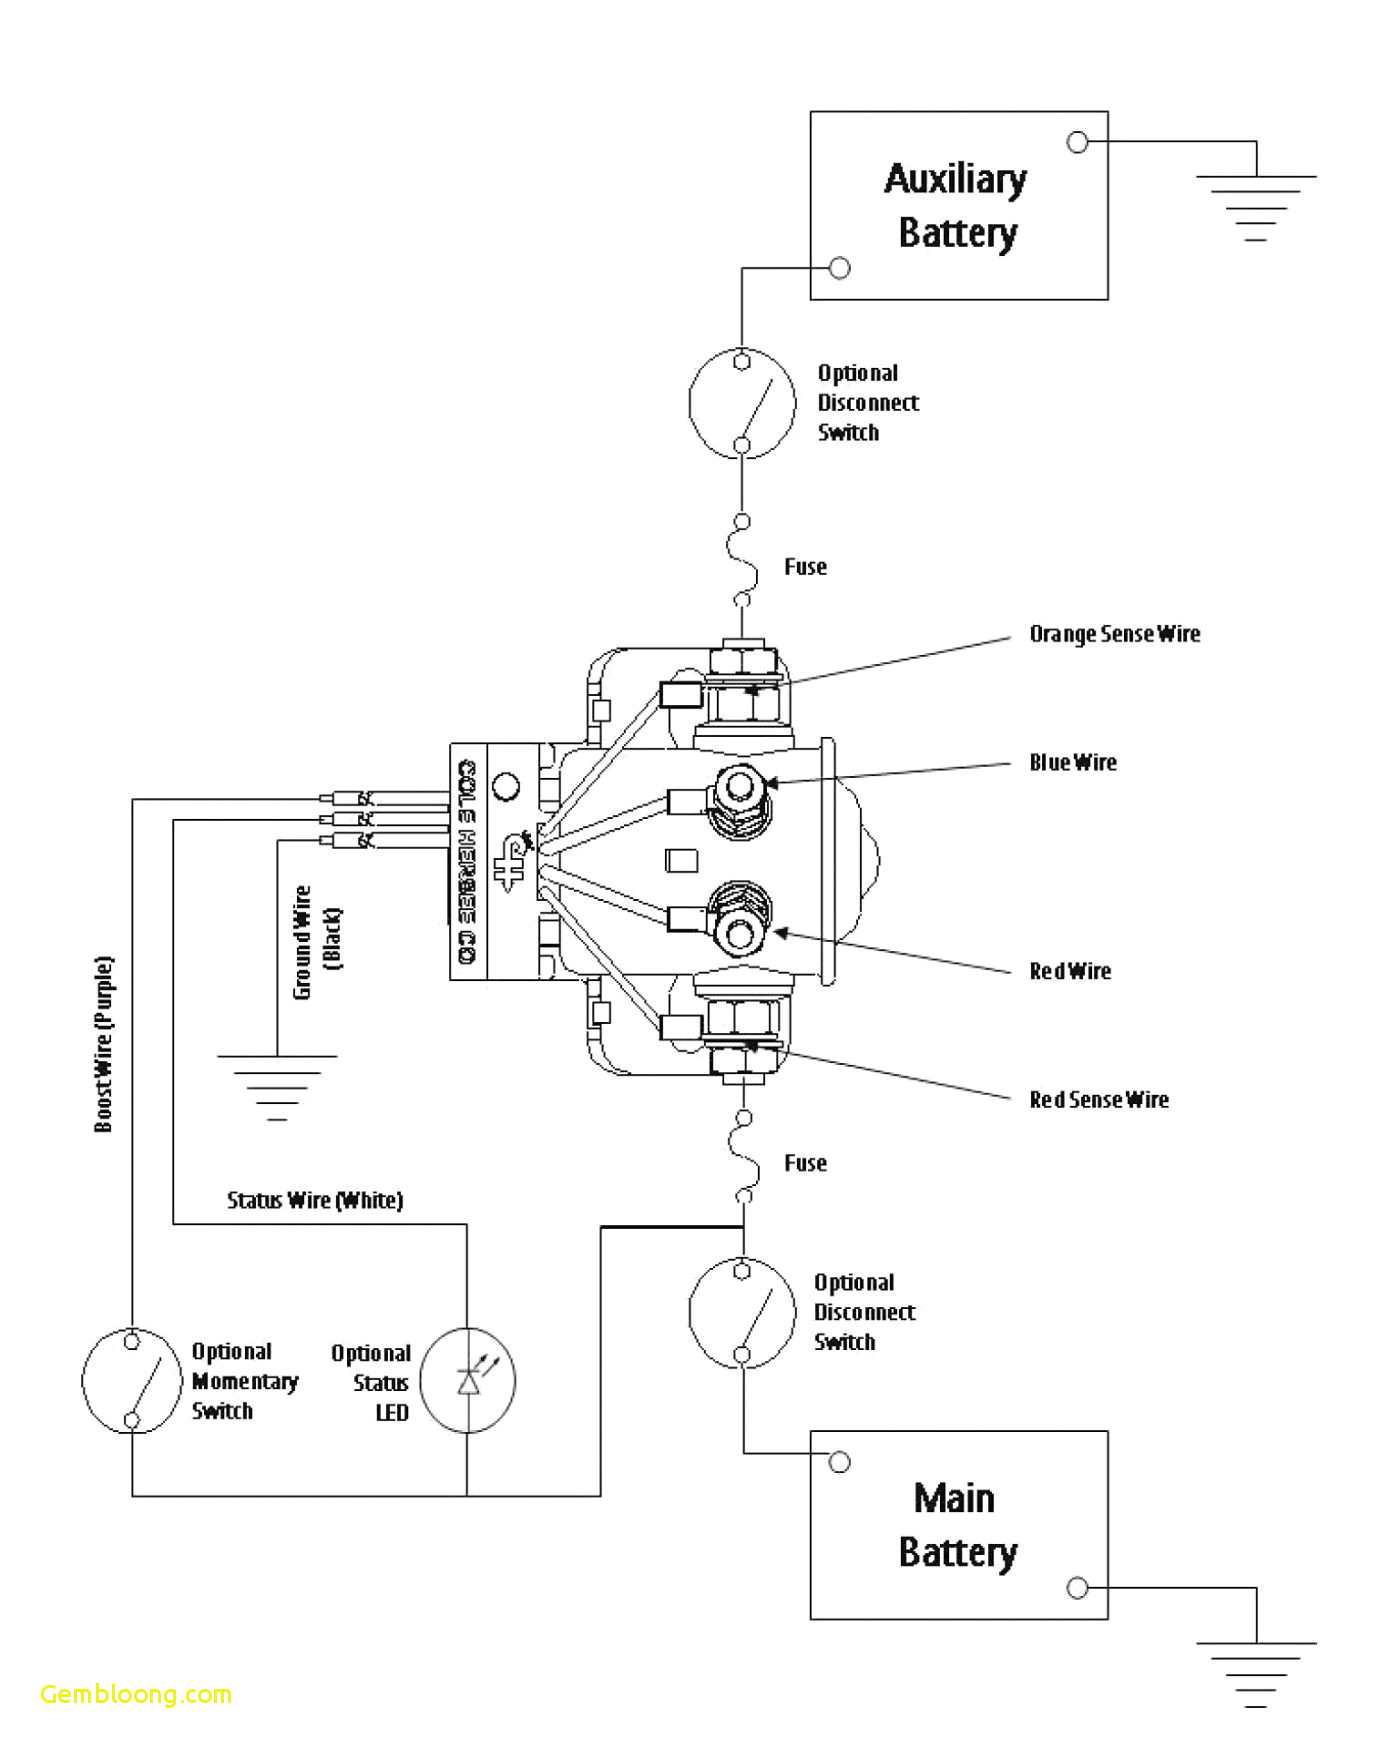 1965 f100 wiring diagram wiring diagram show 65 ford mustang wiring diagram 65 ford wiring diagram